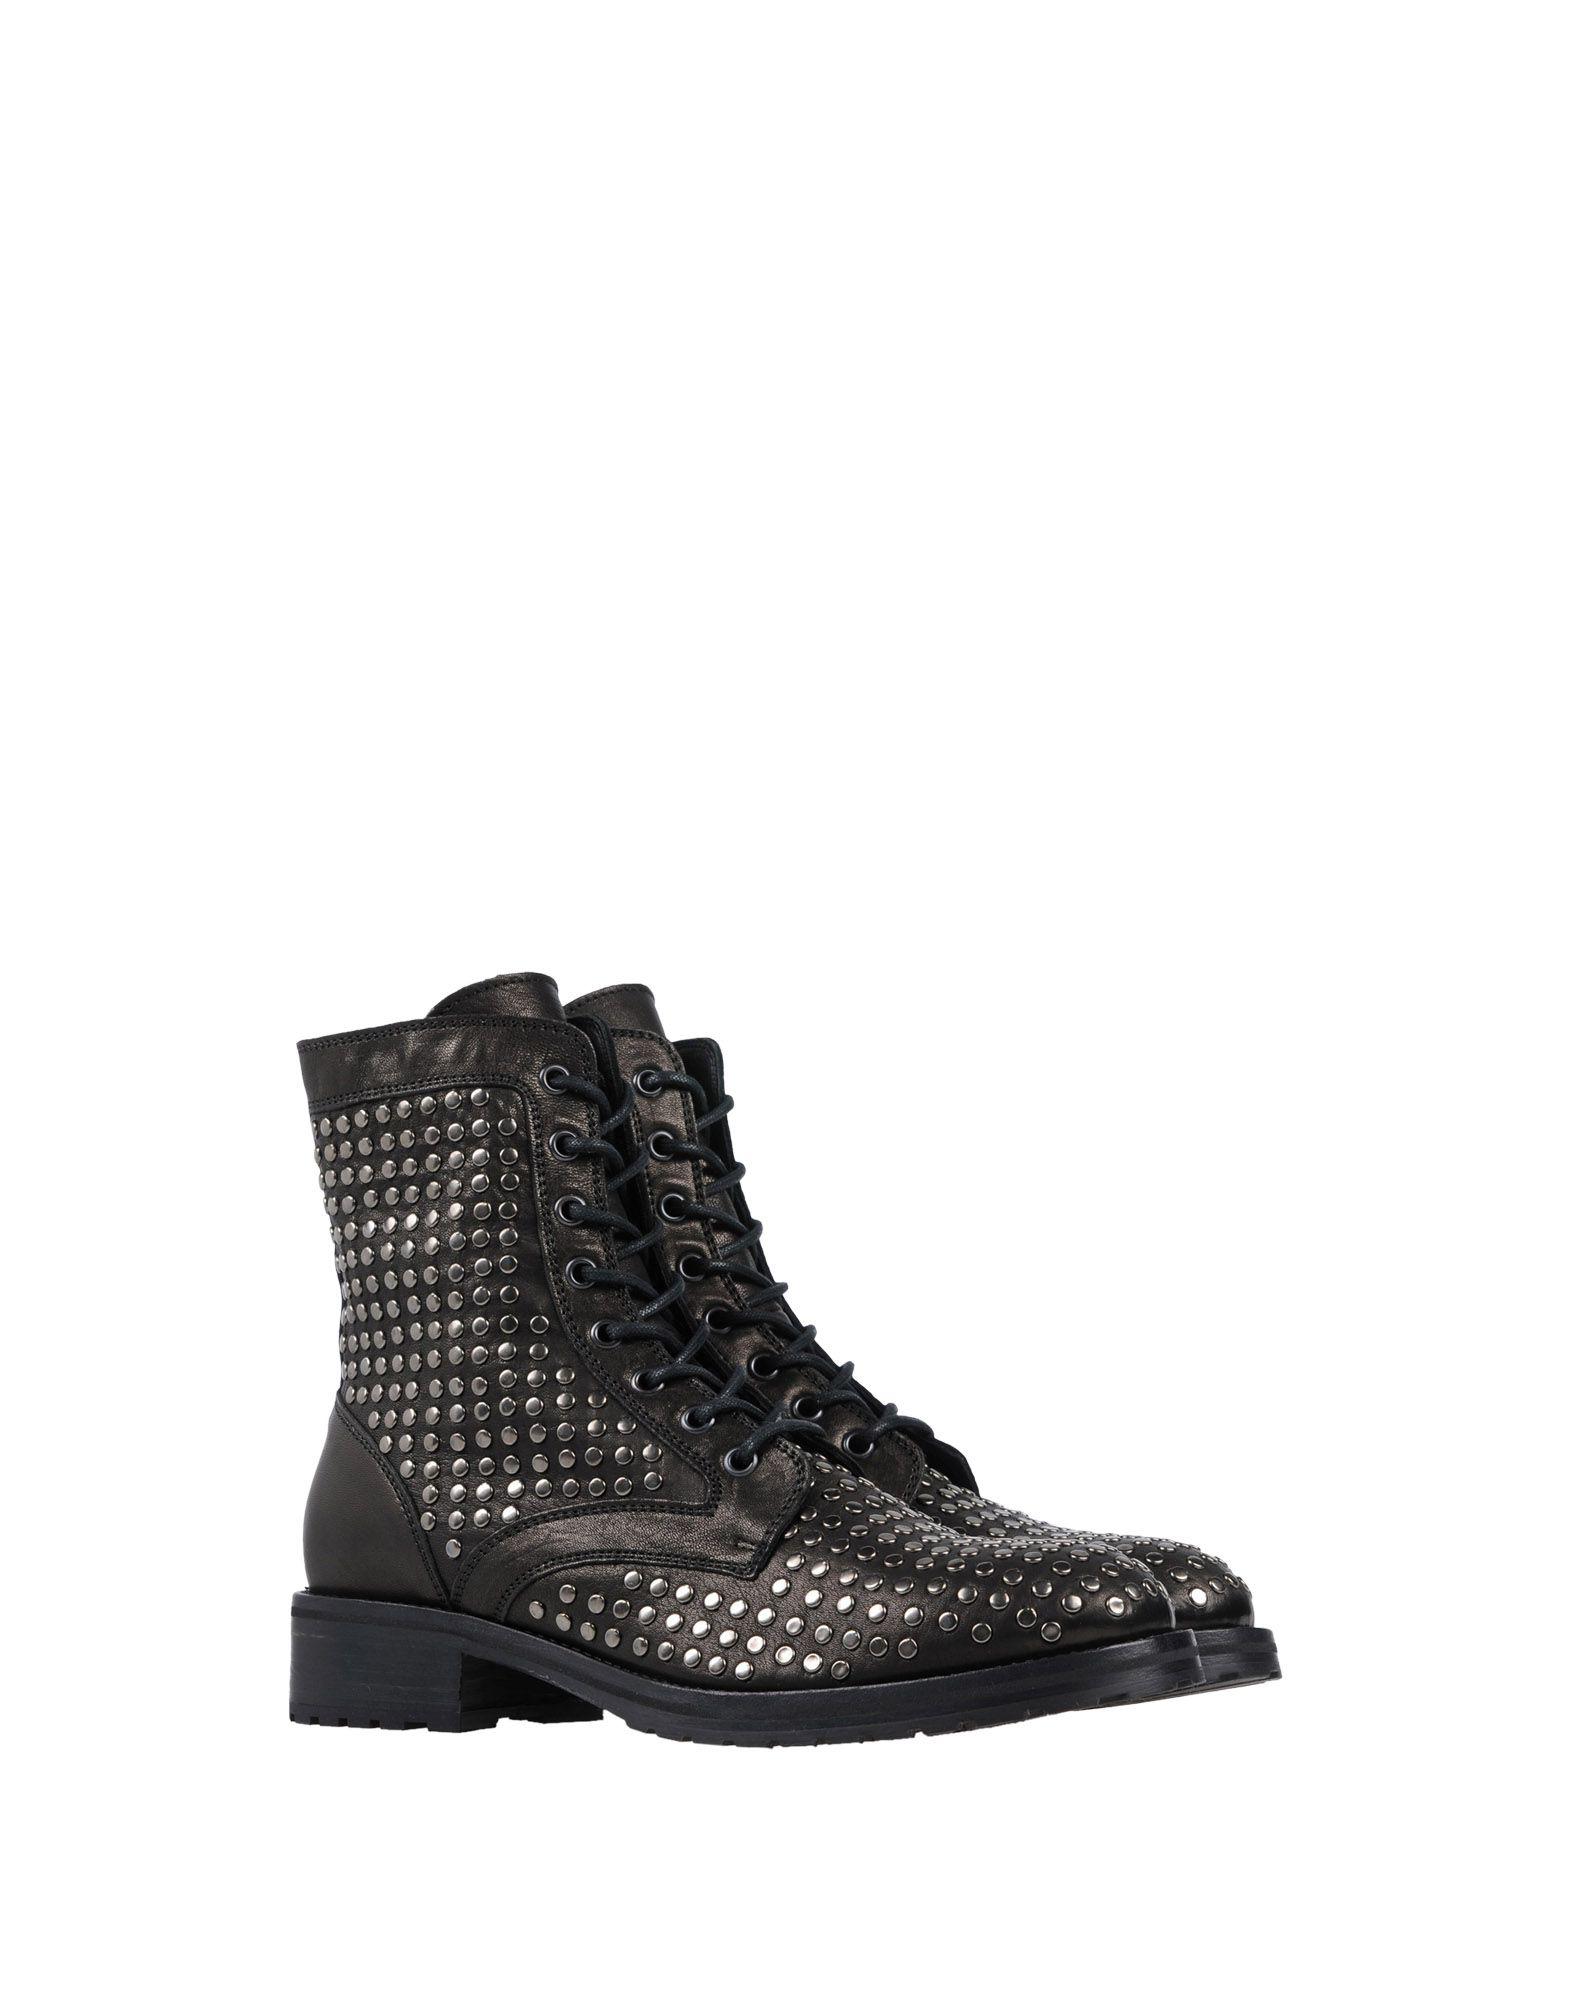 Stilvolle billige Schuhe Damen Lemaré Stiefelette Damen Schuhe  11450585JG a7f81f